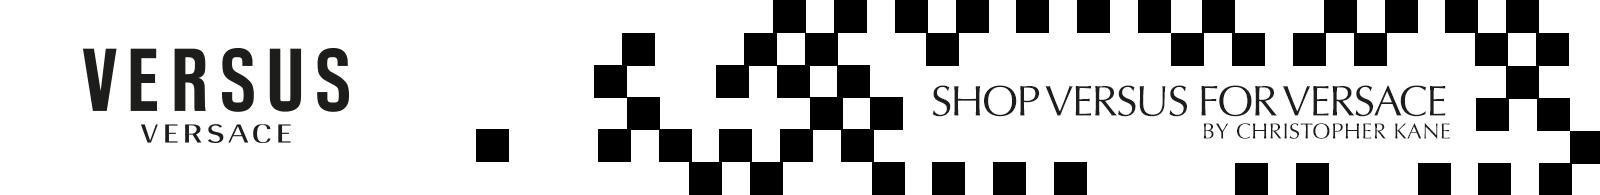 RIJOUX - Logo, Butik Branding, Online Branding